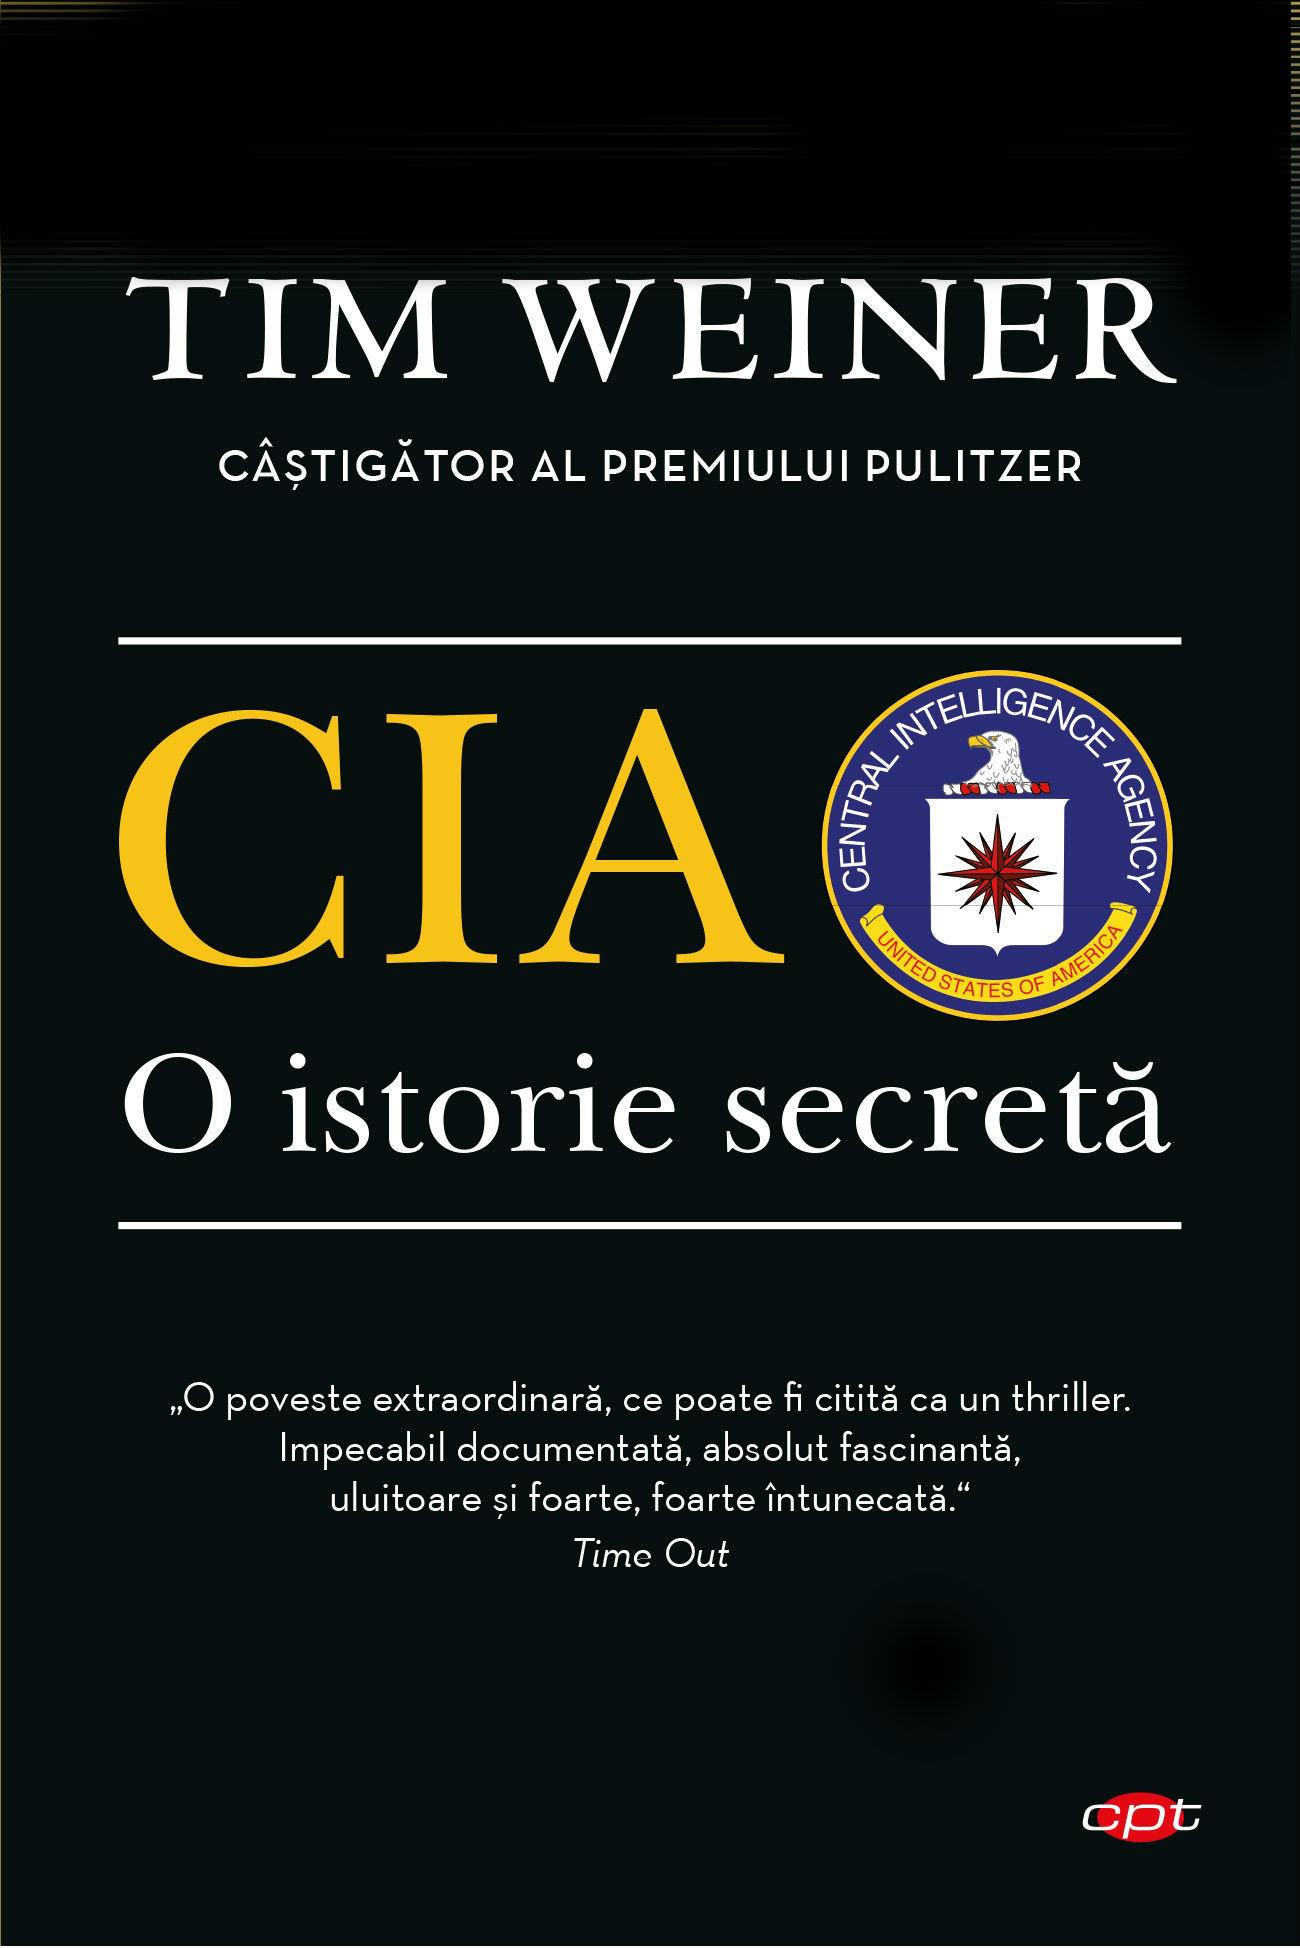 CIA, o istorie secretă